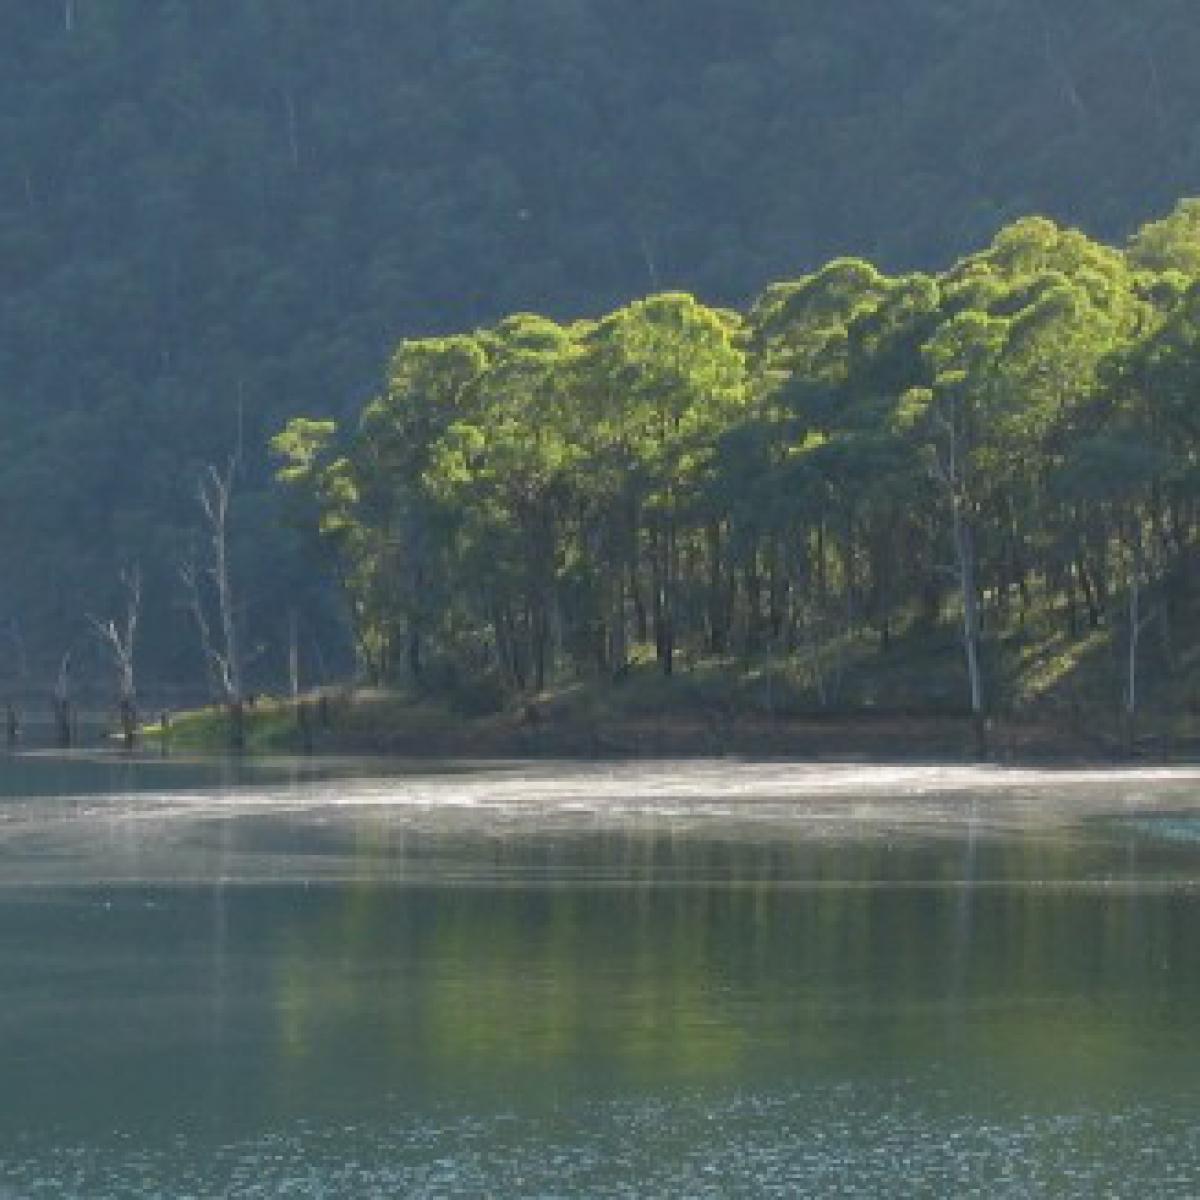 Special light on Talbingo Reservoir - Kosciuiszko National Park